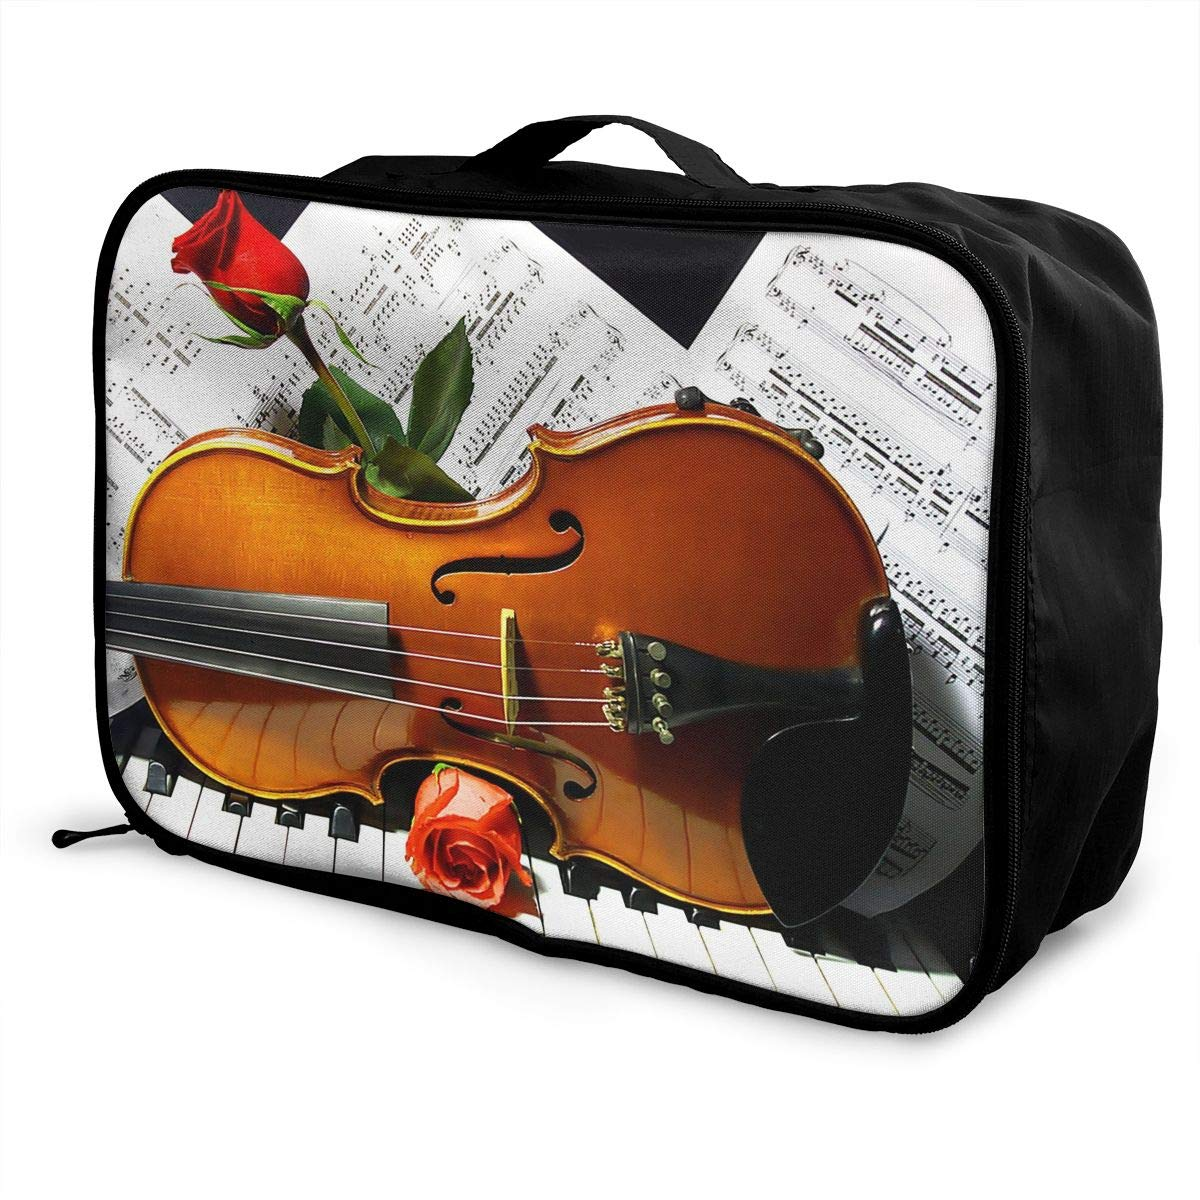 Travel Luggage Duffle Bag Lightweight Portable Handbag Musical Instruments Guitar Large Capacity Waterproof Foldable Storage Tote